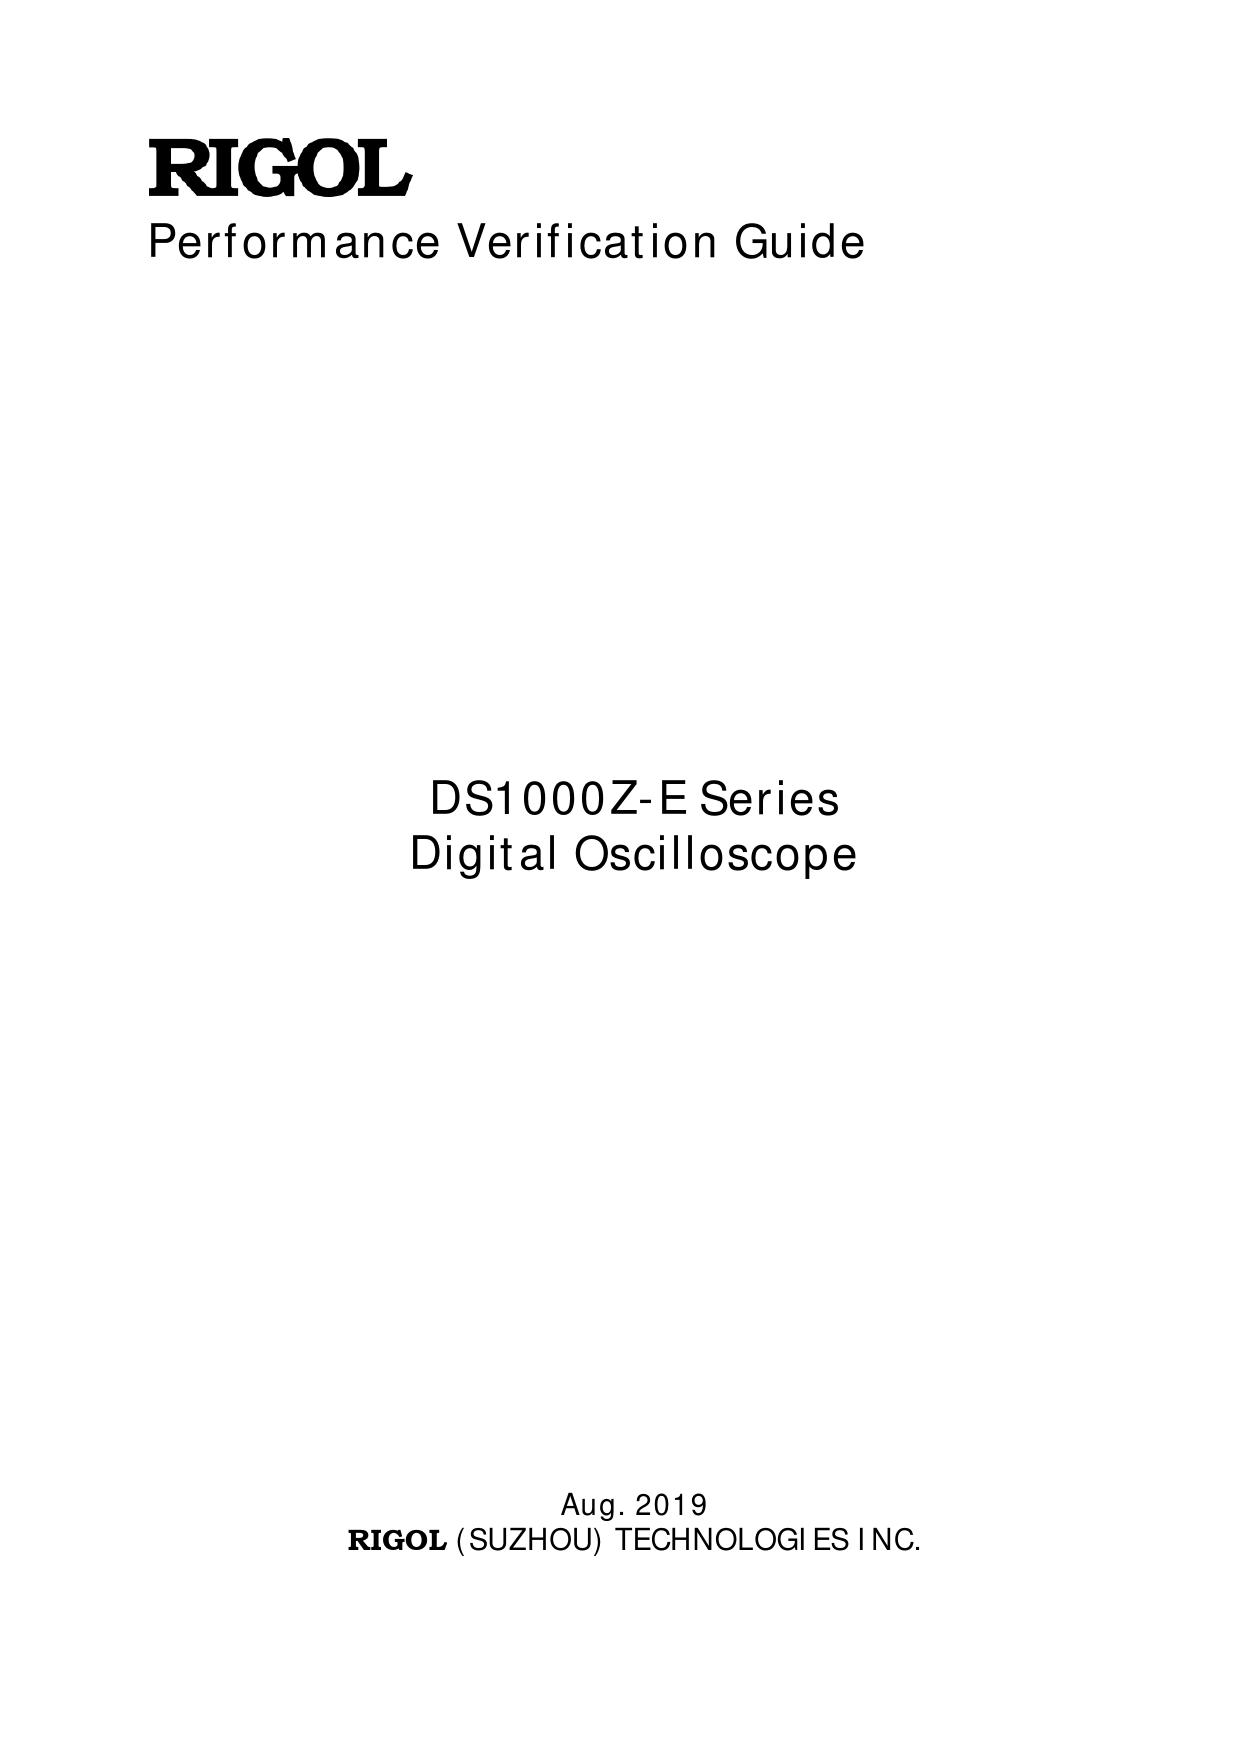 Performance Verification Guide DS1000Z-E Series Rigol